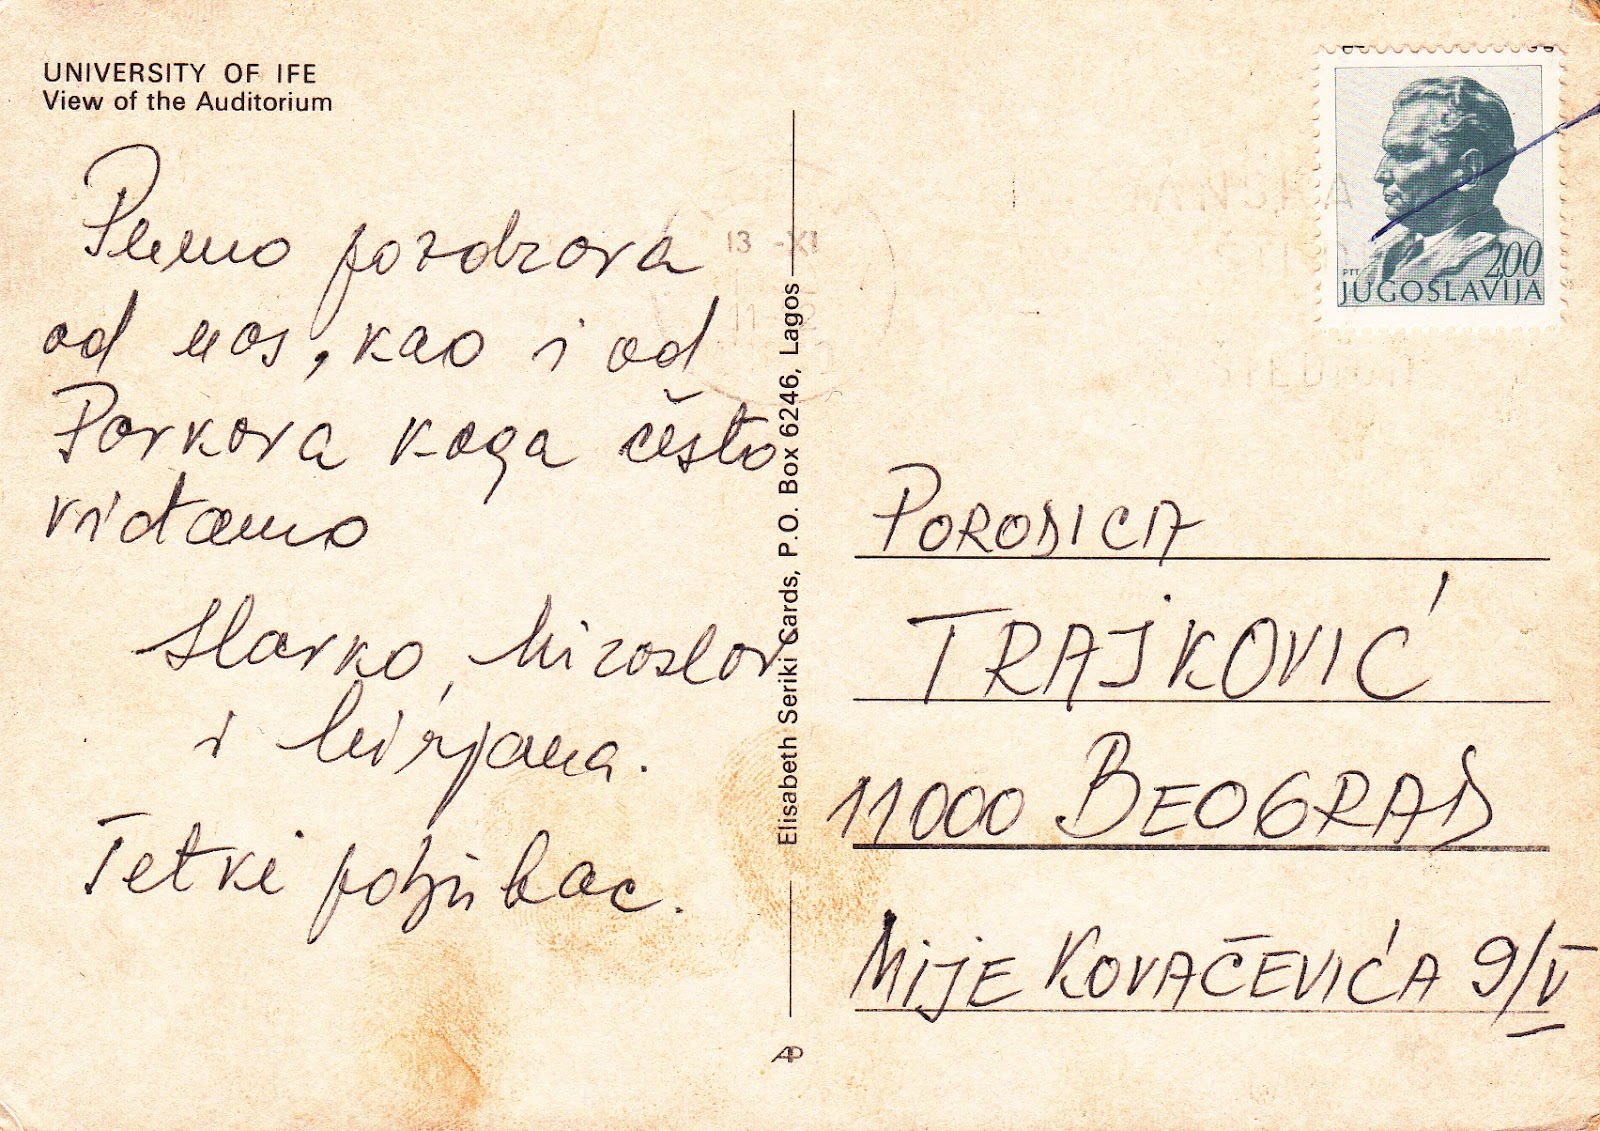 467cb79e6b6 Postales Inventadas  Making up Postcards  724. University of Ife ...